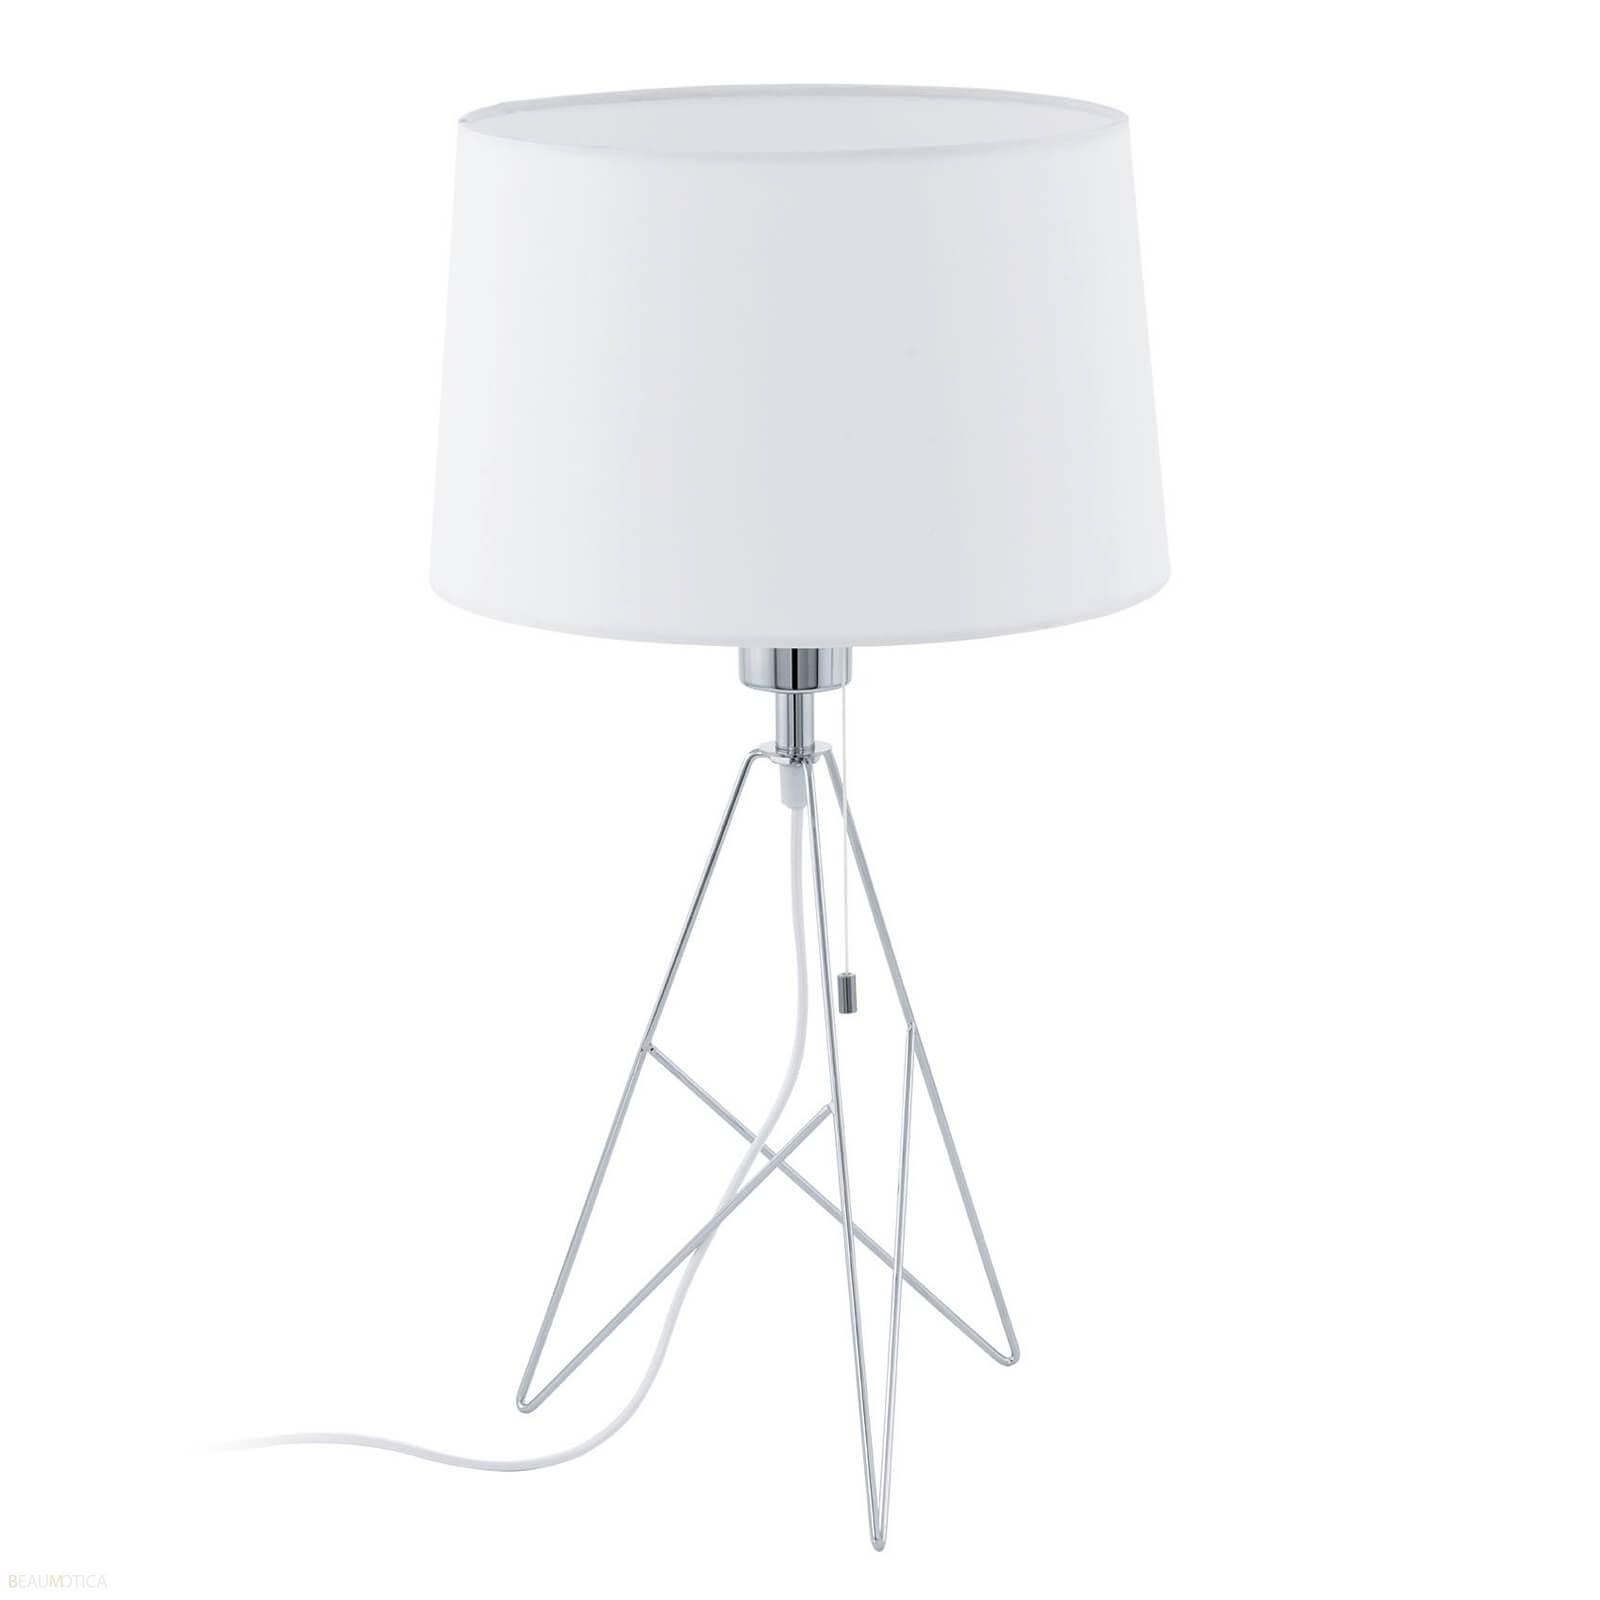 Afbeelding van Eglo Camporale Tafellamp Wit, Chroom (ø30cm)